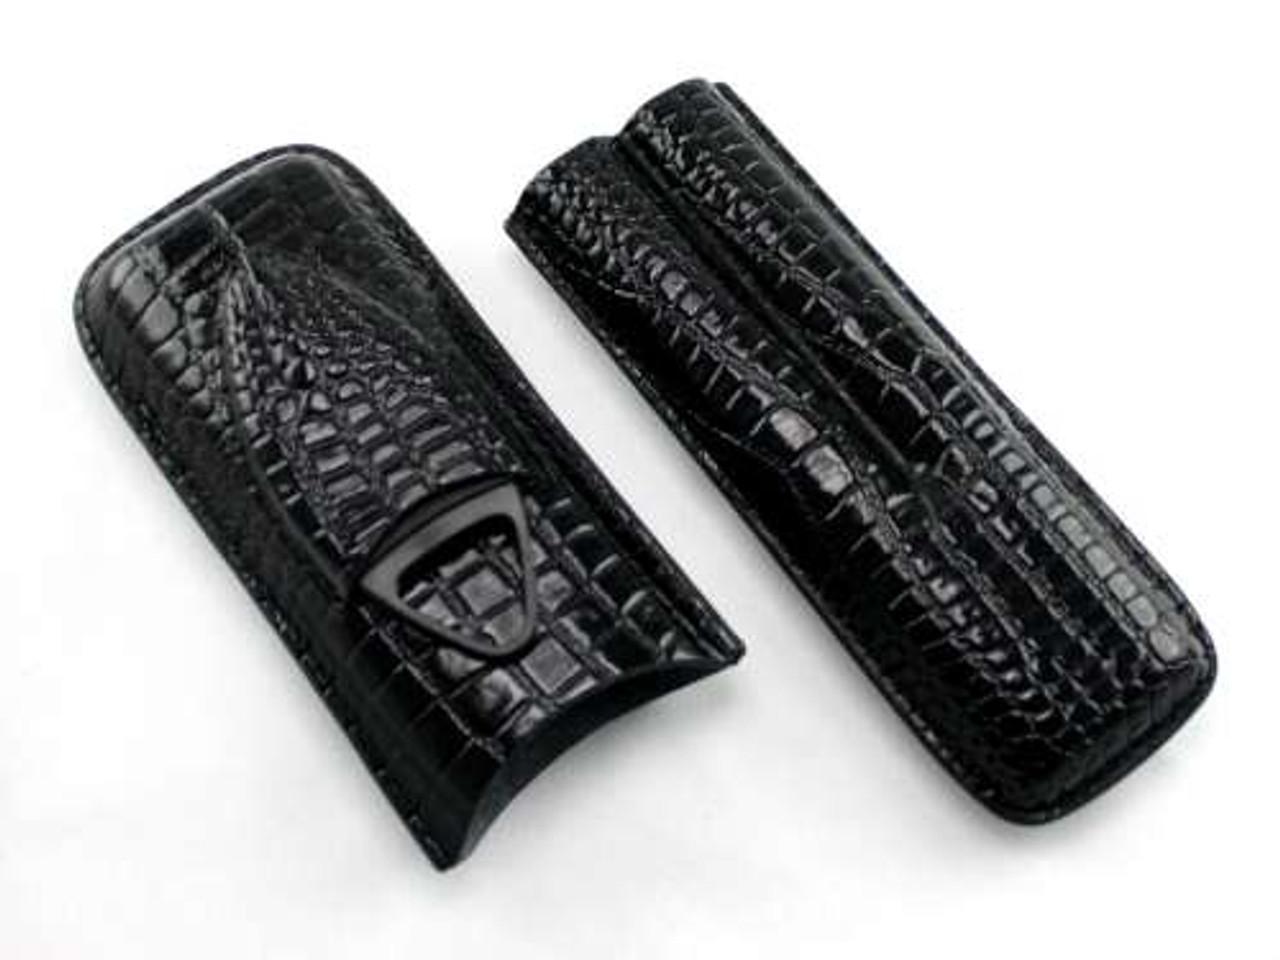 Black Century Crocodile Cigar Case with Cutter